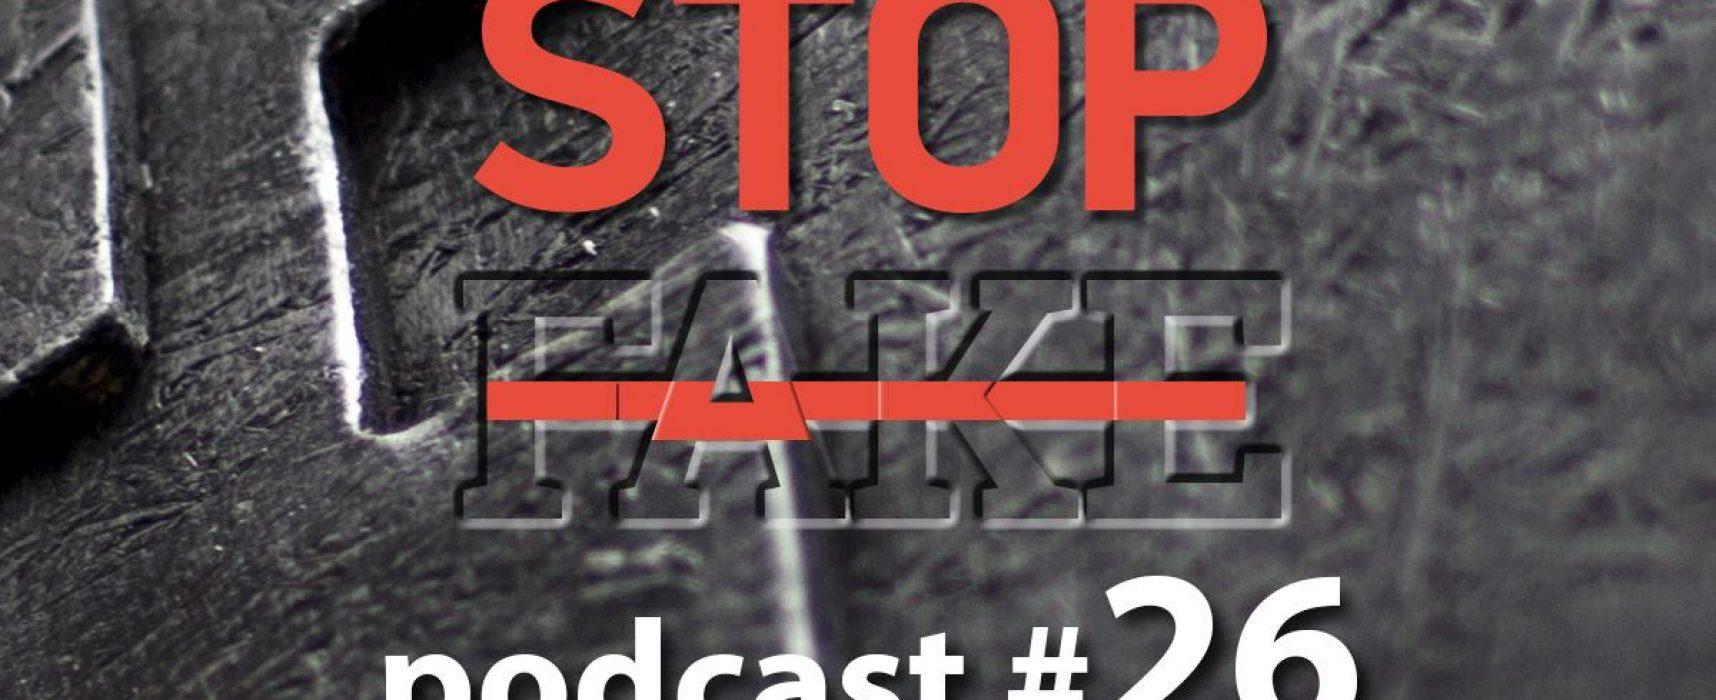 StopFake podcast #26